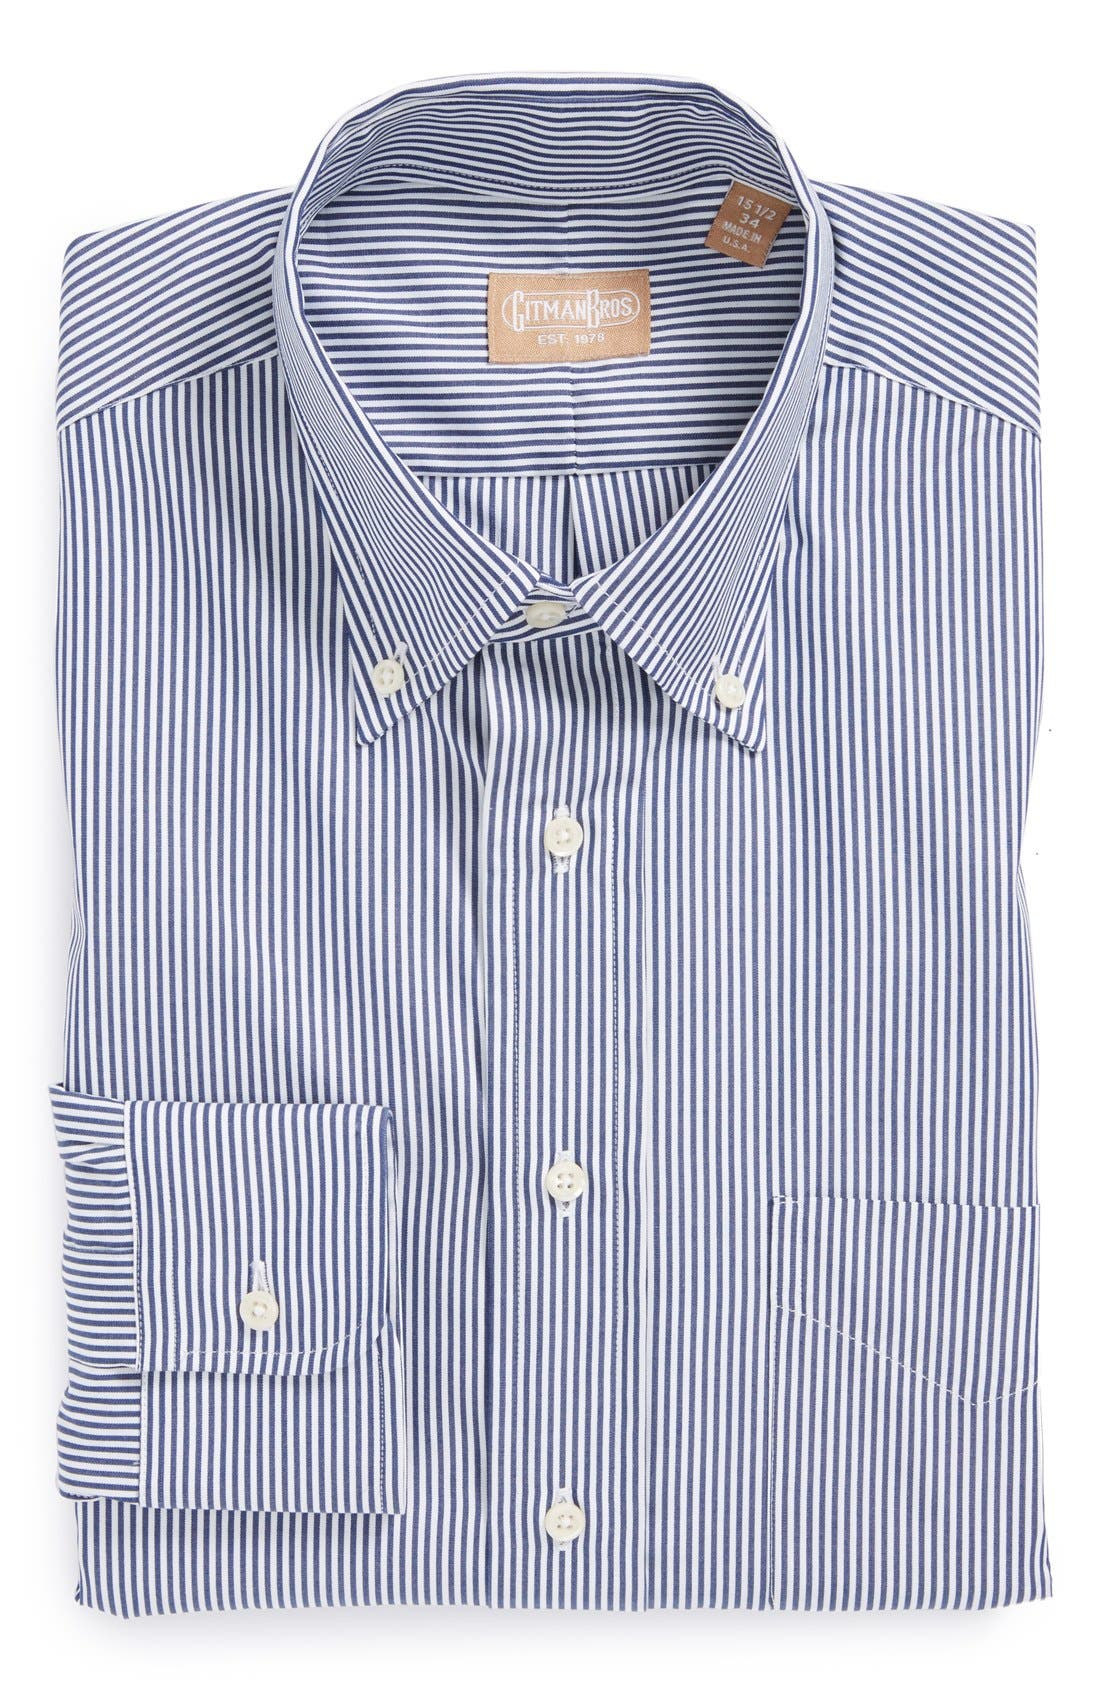 Regular Fit Bengal Stripe Cotton Broadcloth Button Down Dress Shirt,                         Main,                         color, NAVY